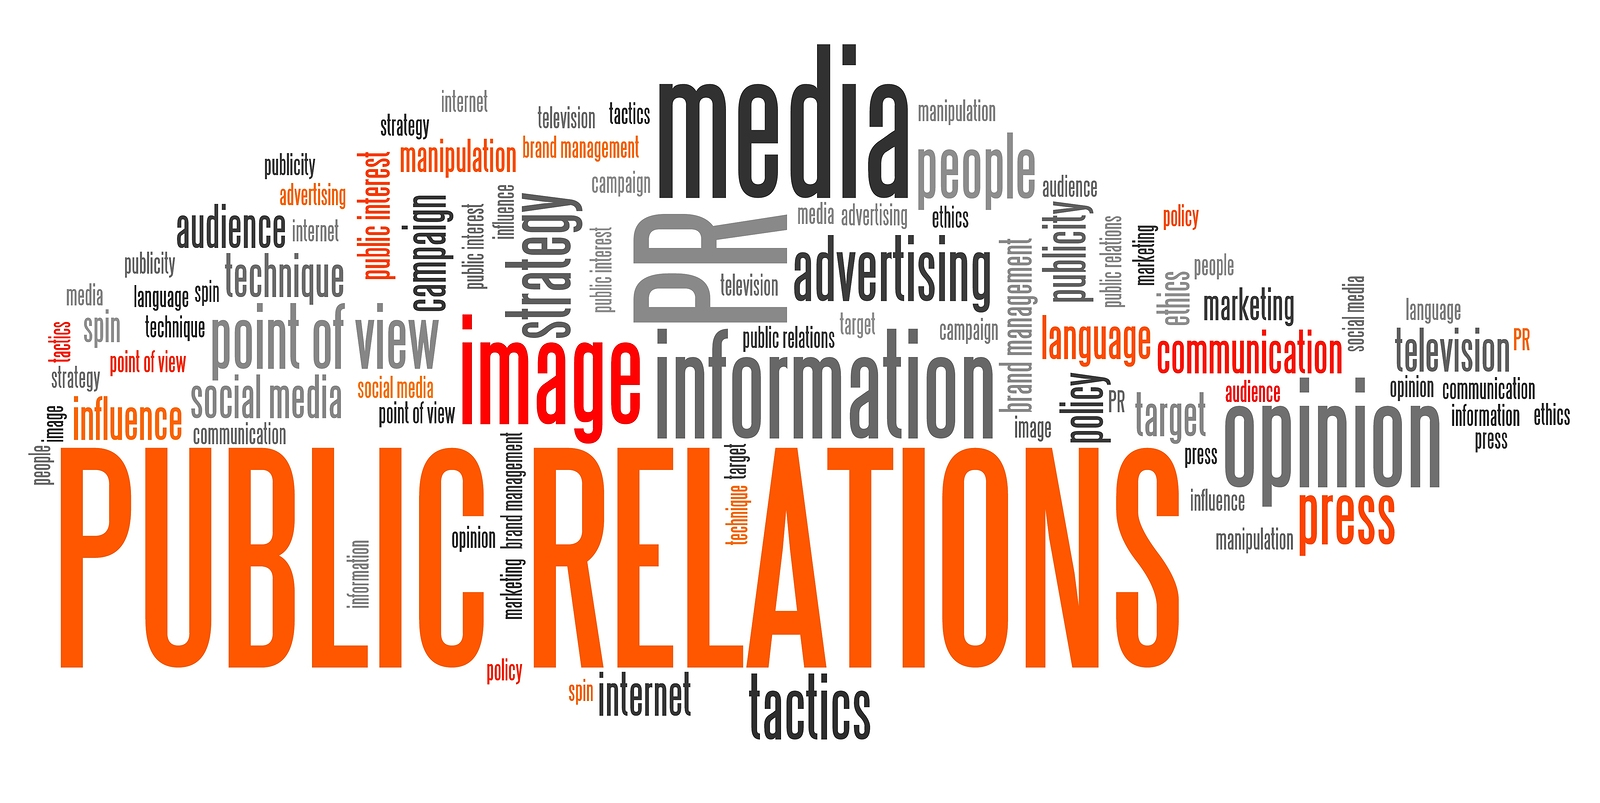 bigstock-Public-Relations-71587531.jpg